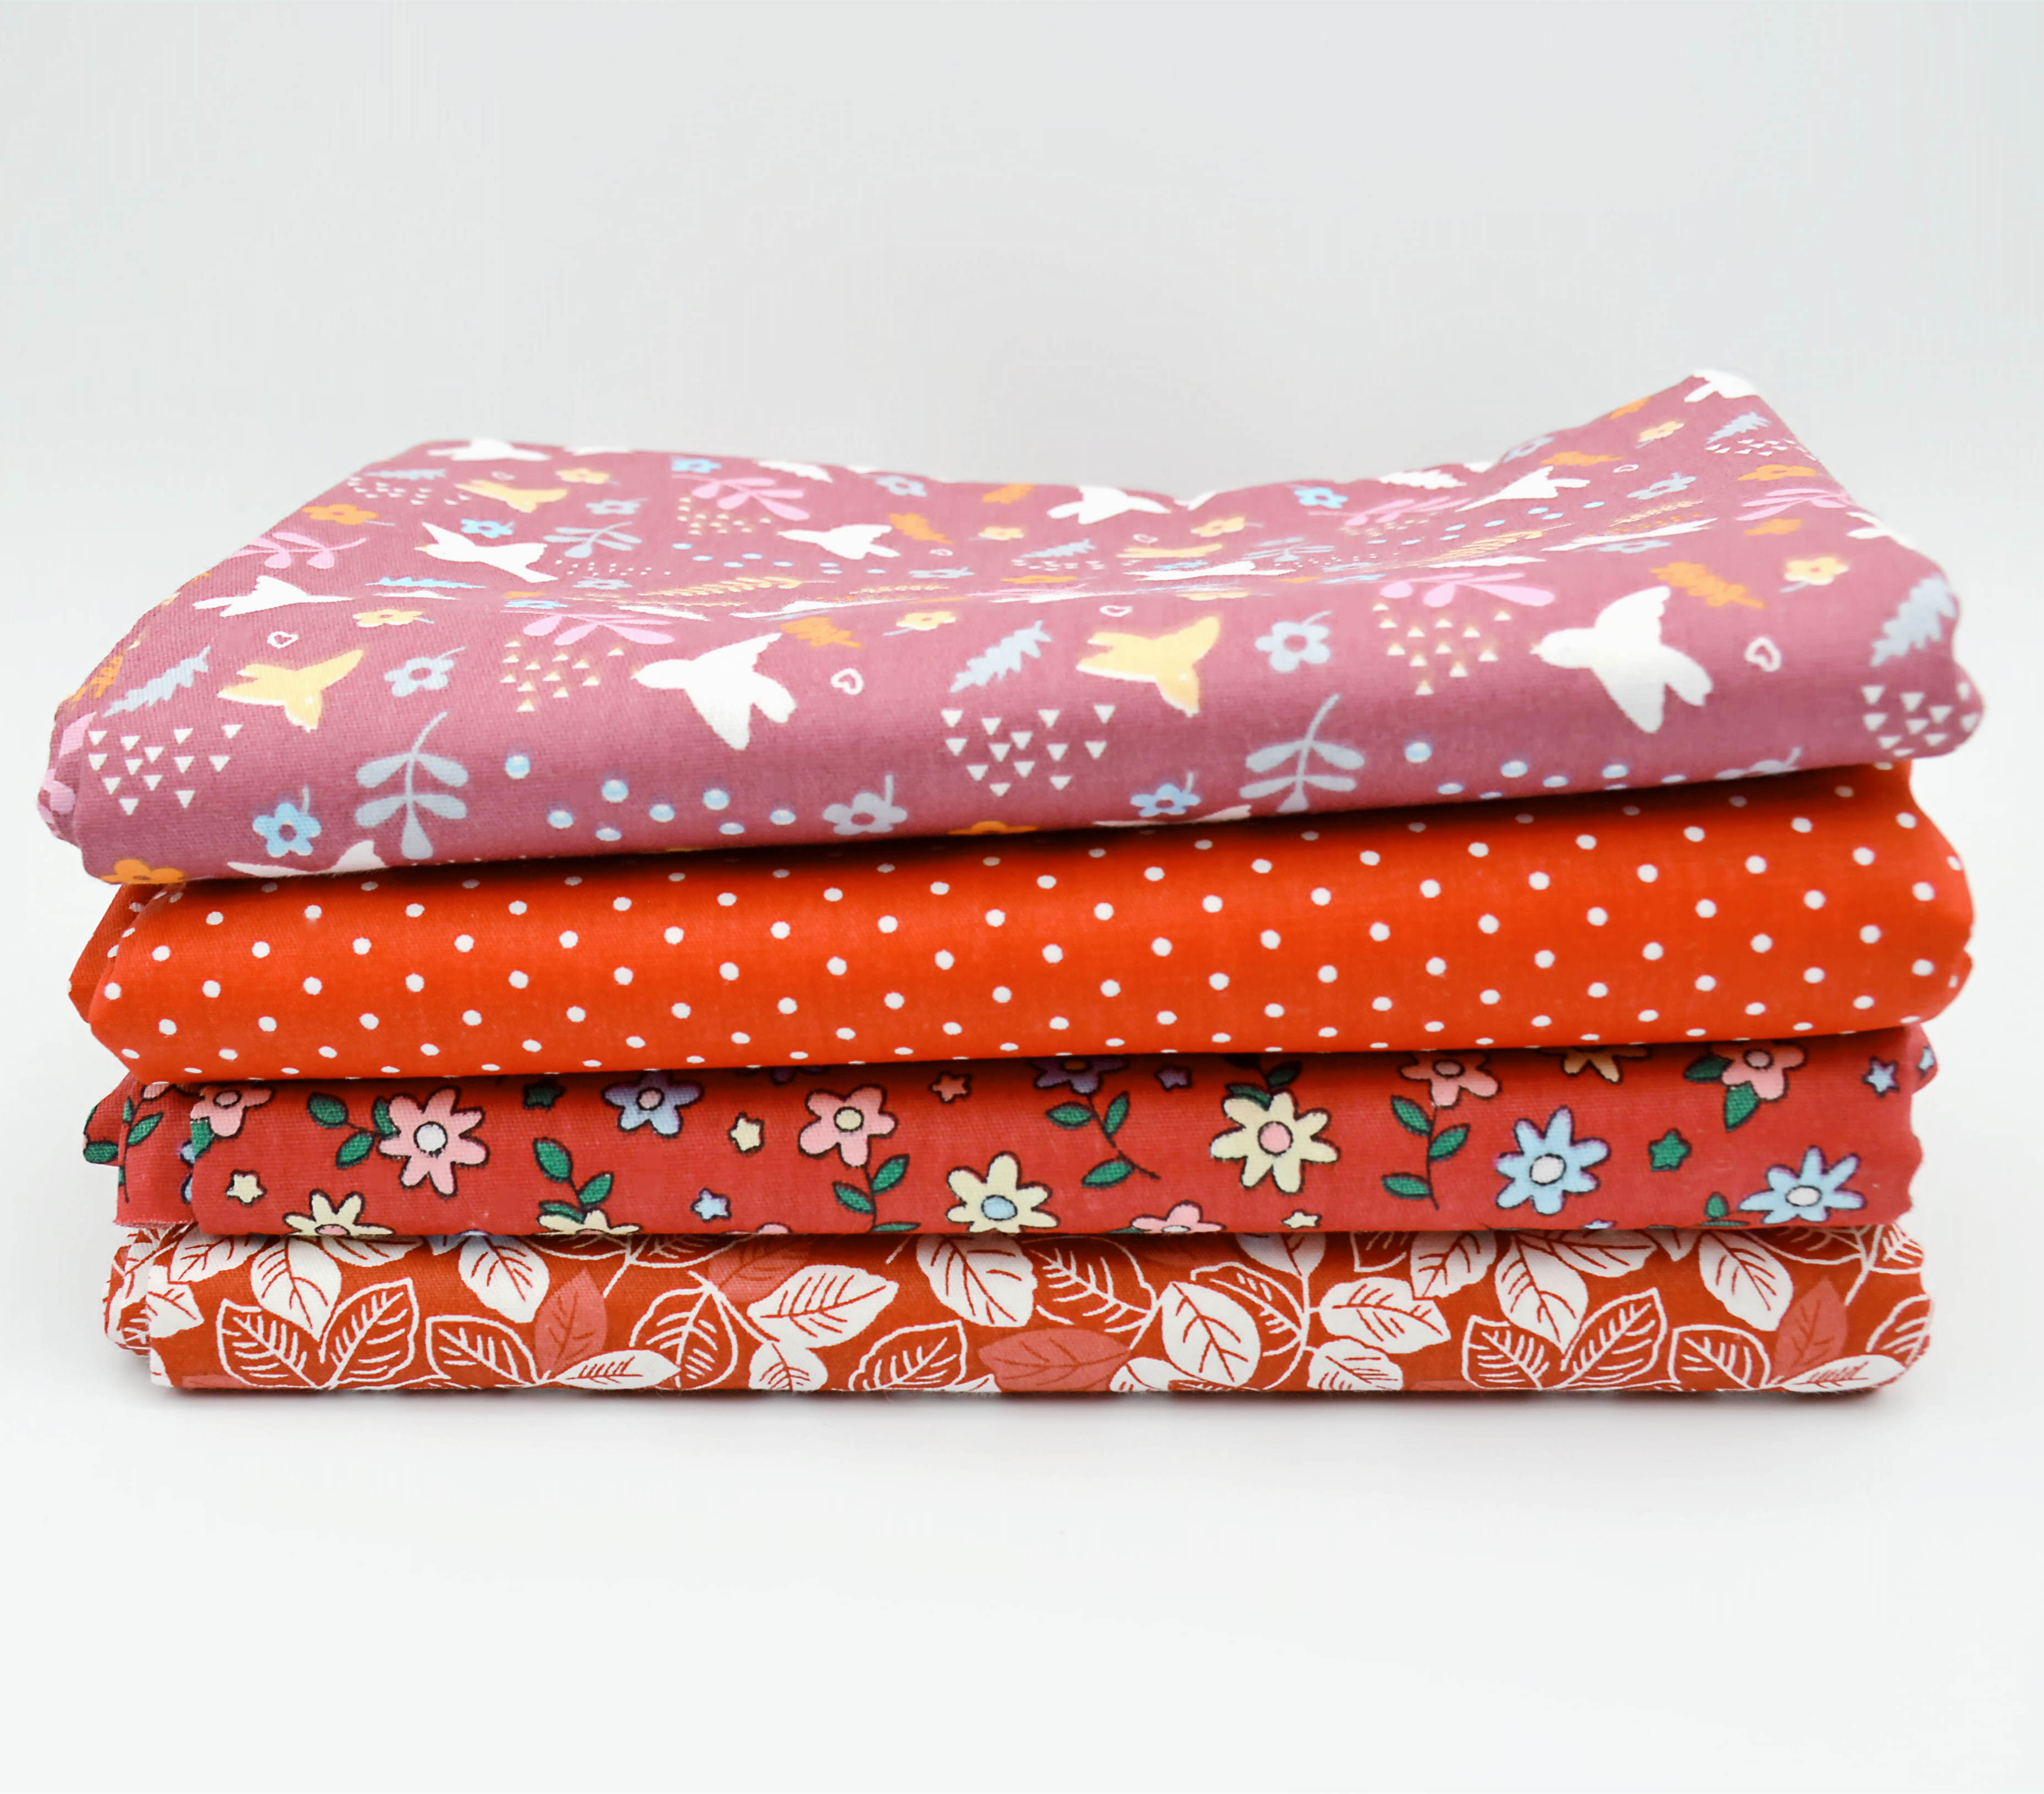 4pcs Hand-Dyed Cotton Quilt Fabric for Purse Handbag Cushion DIY Patchwork